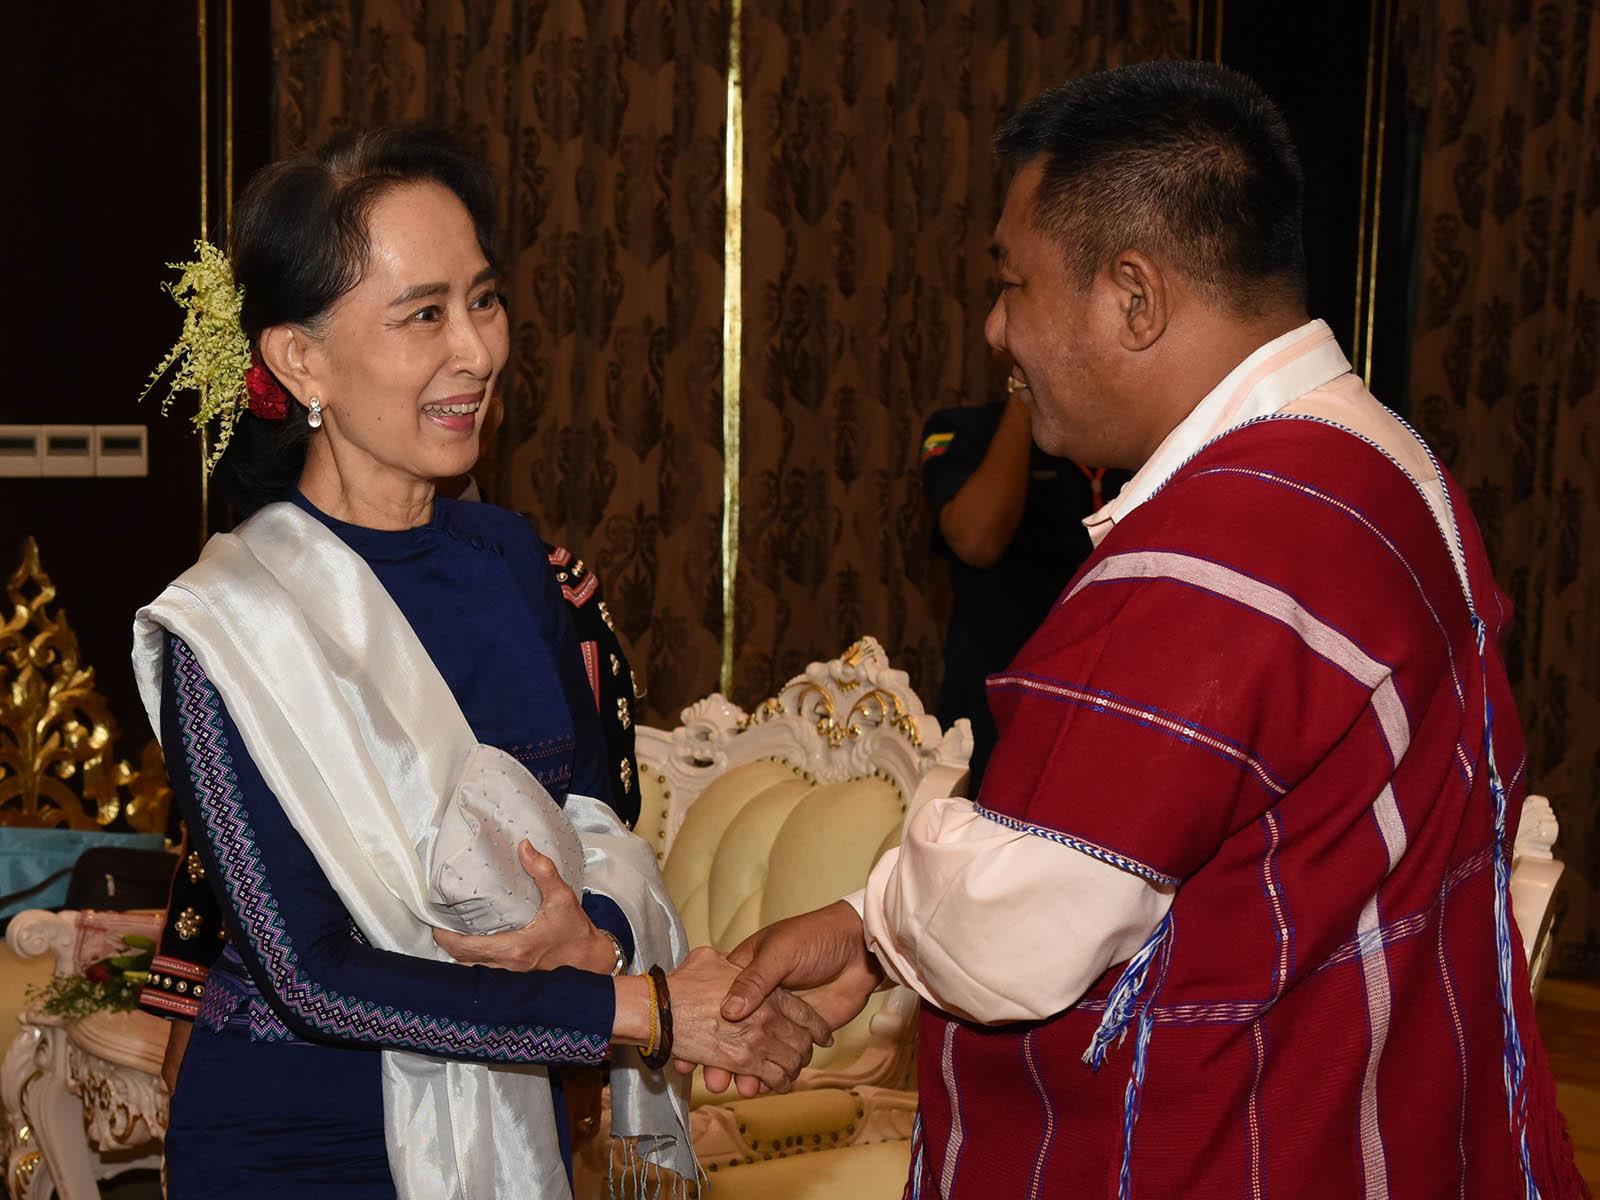 State Counsellor Daw Aung San Suu Kyi greets Chairman of DKBA Saw Moe Shay in Nay Pyi Taw.